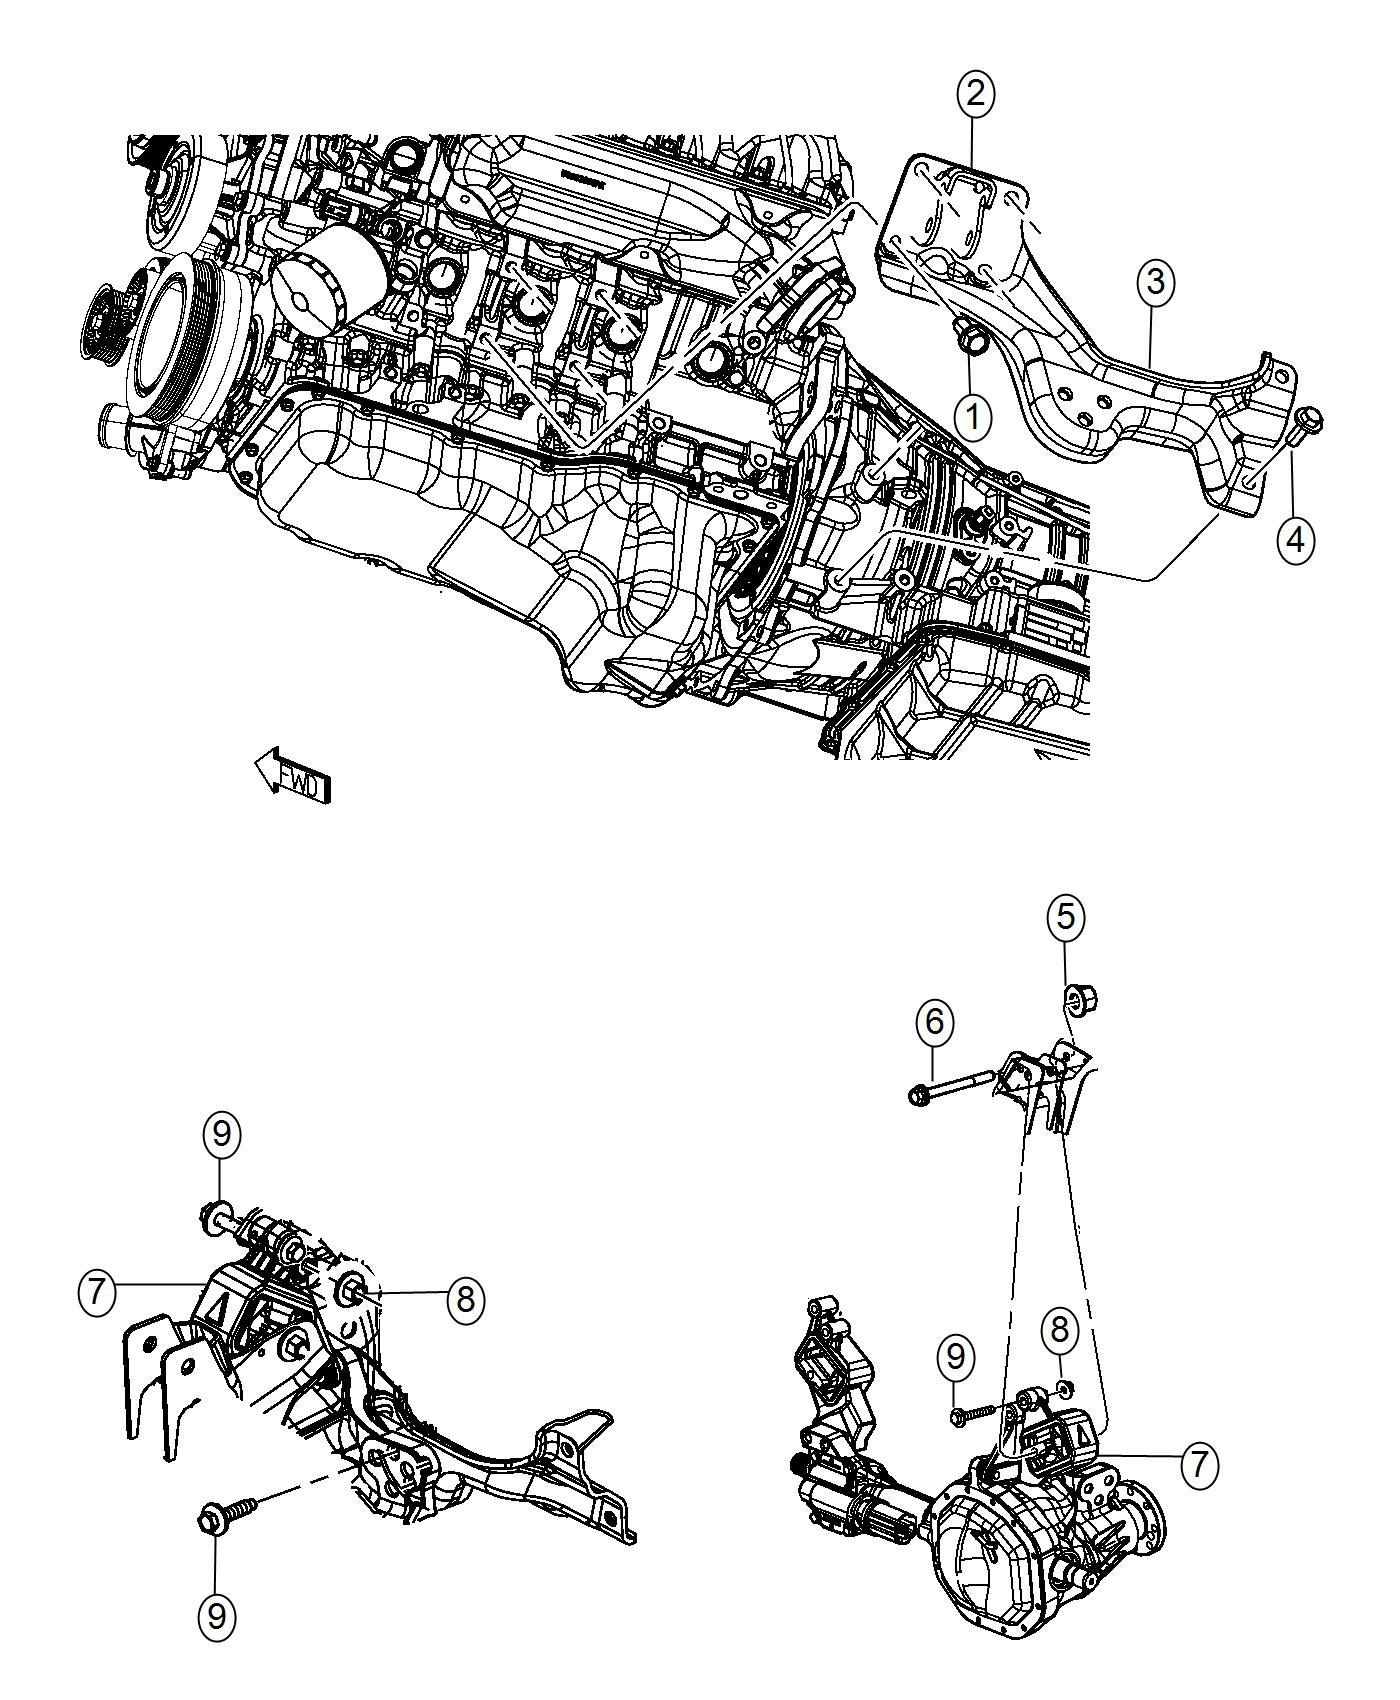 Ram Bracket Engine Mount Left Side Mounting